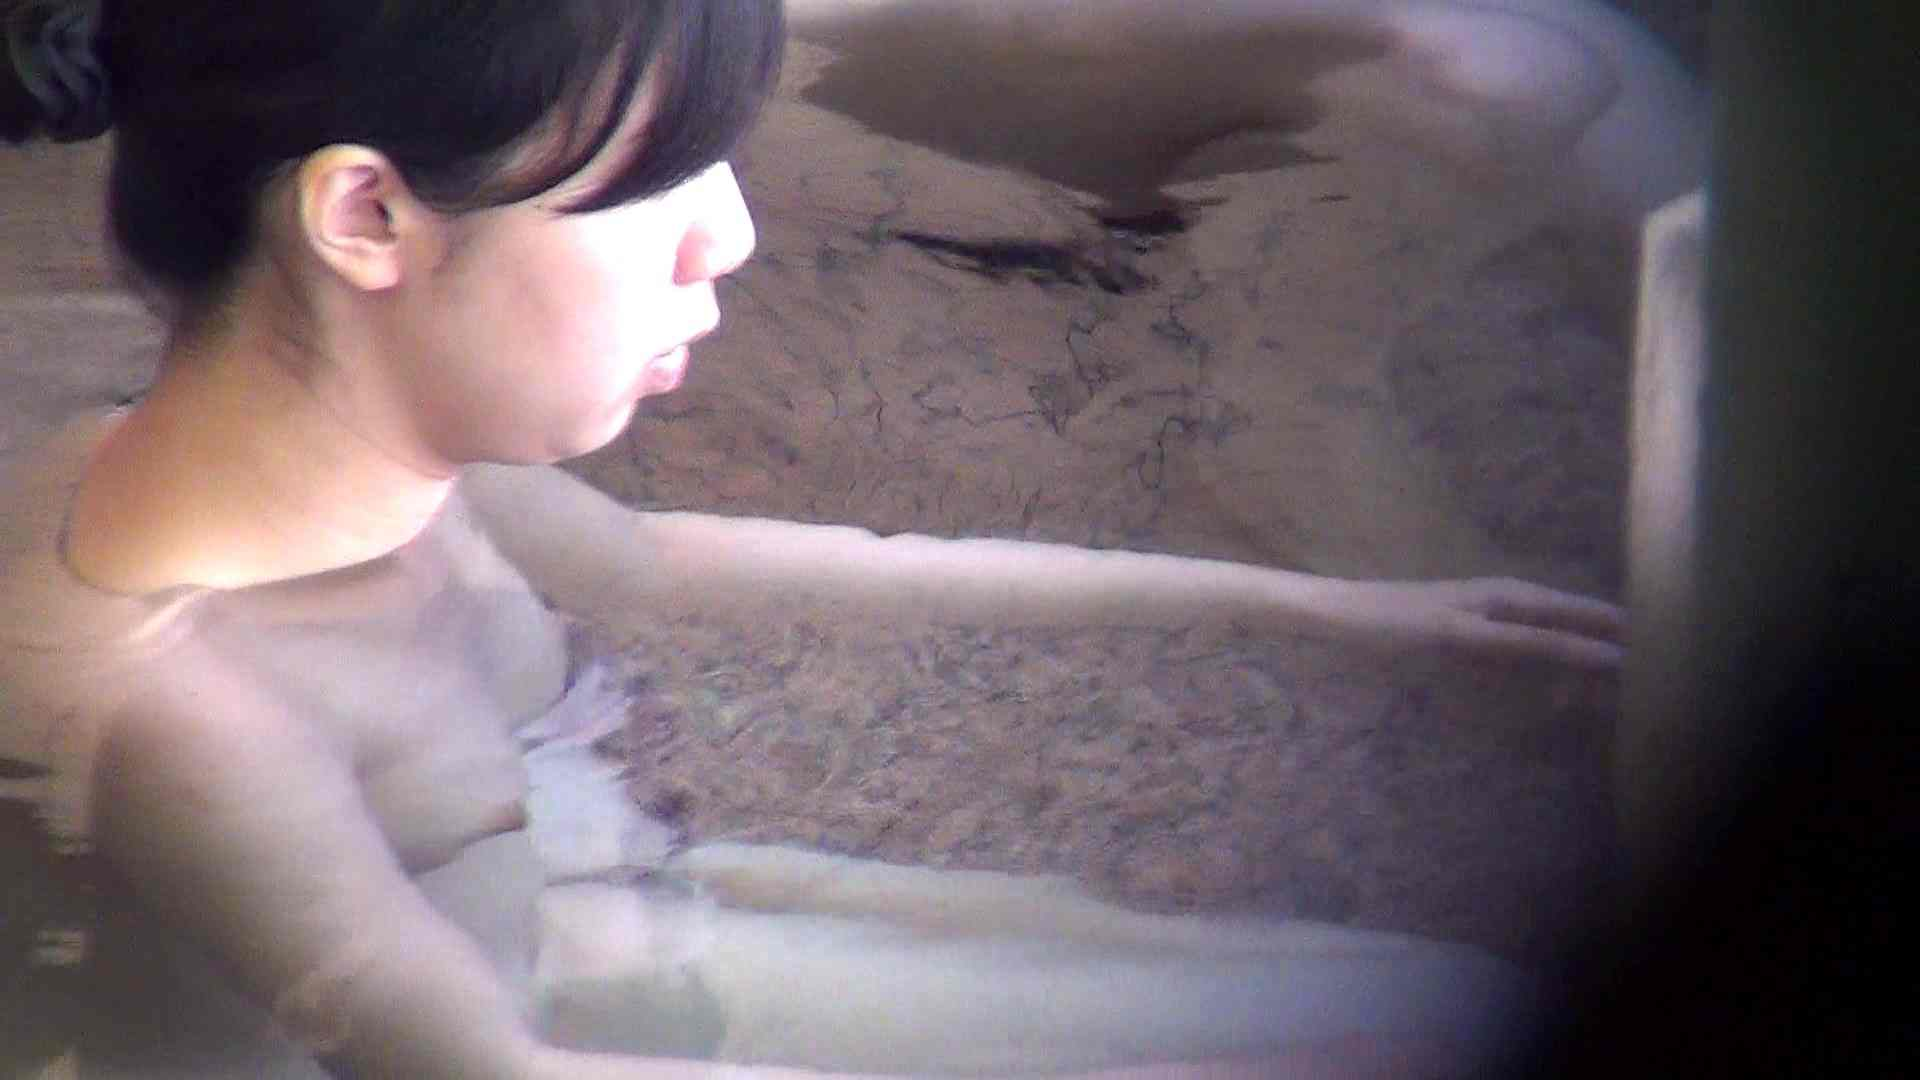 Aquaな露天風呂Vol.285 OLのエロ生活 | 露天風呂  24連発 22